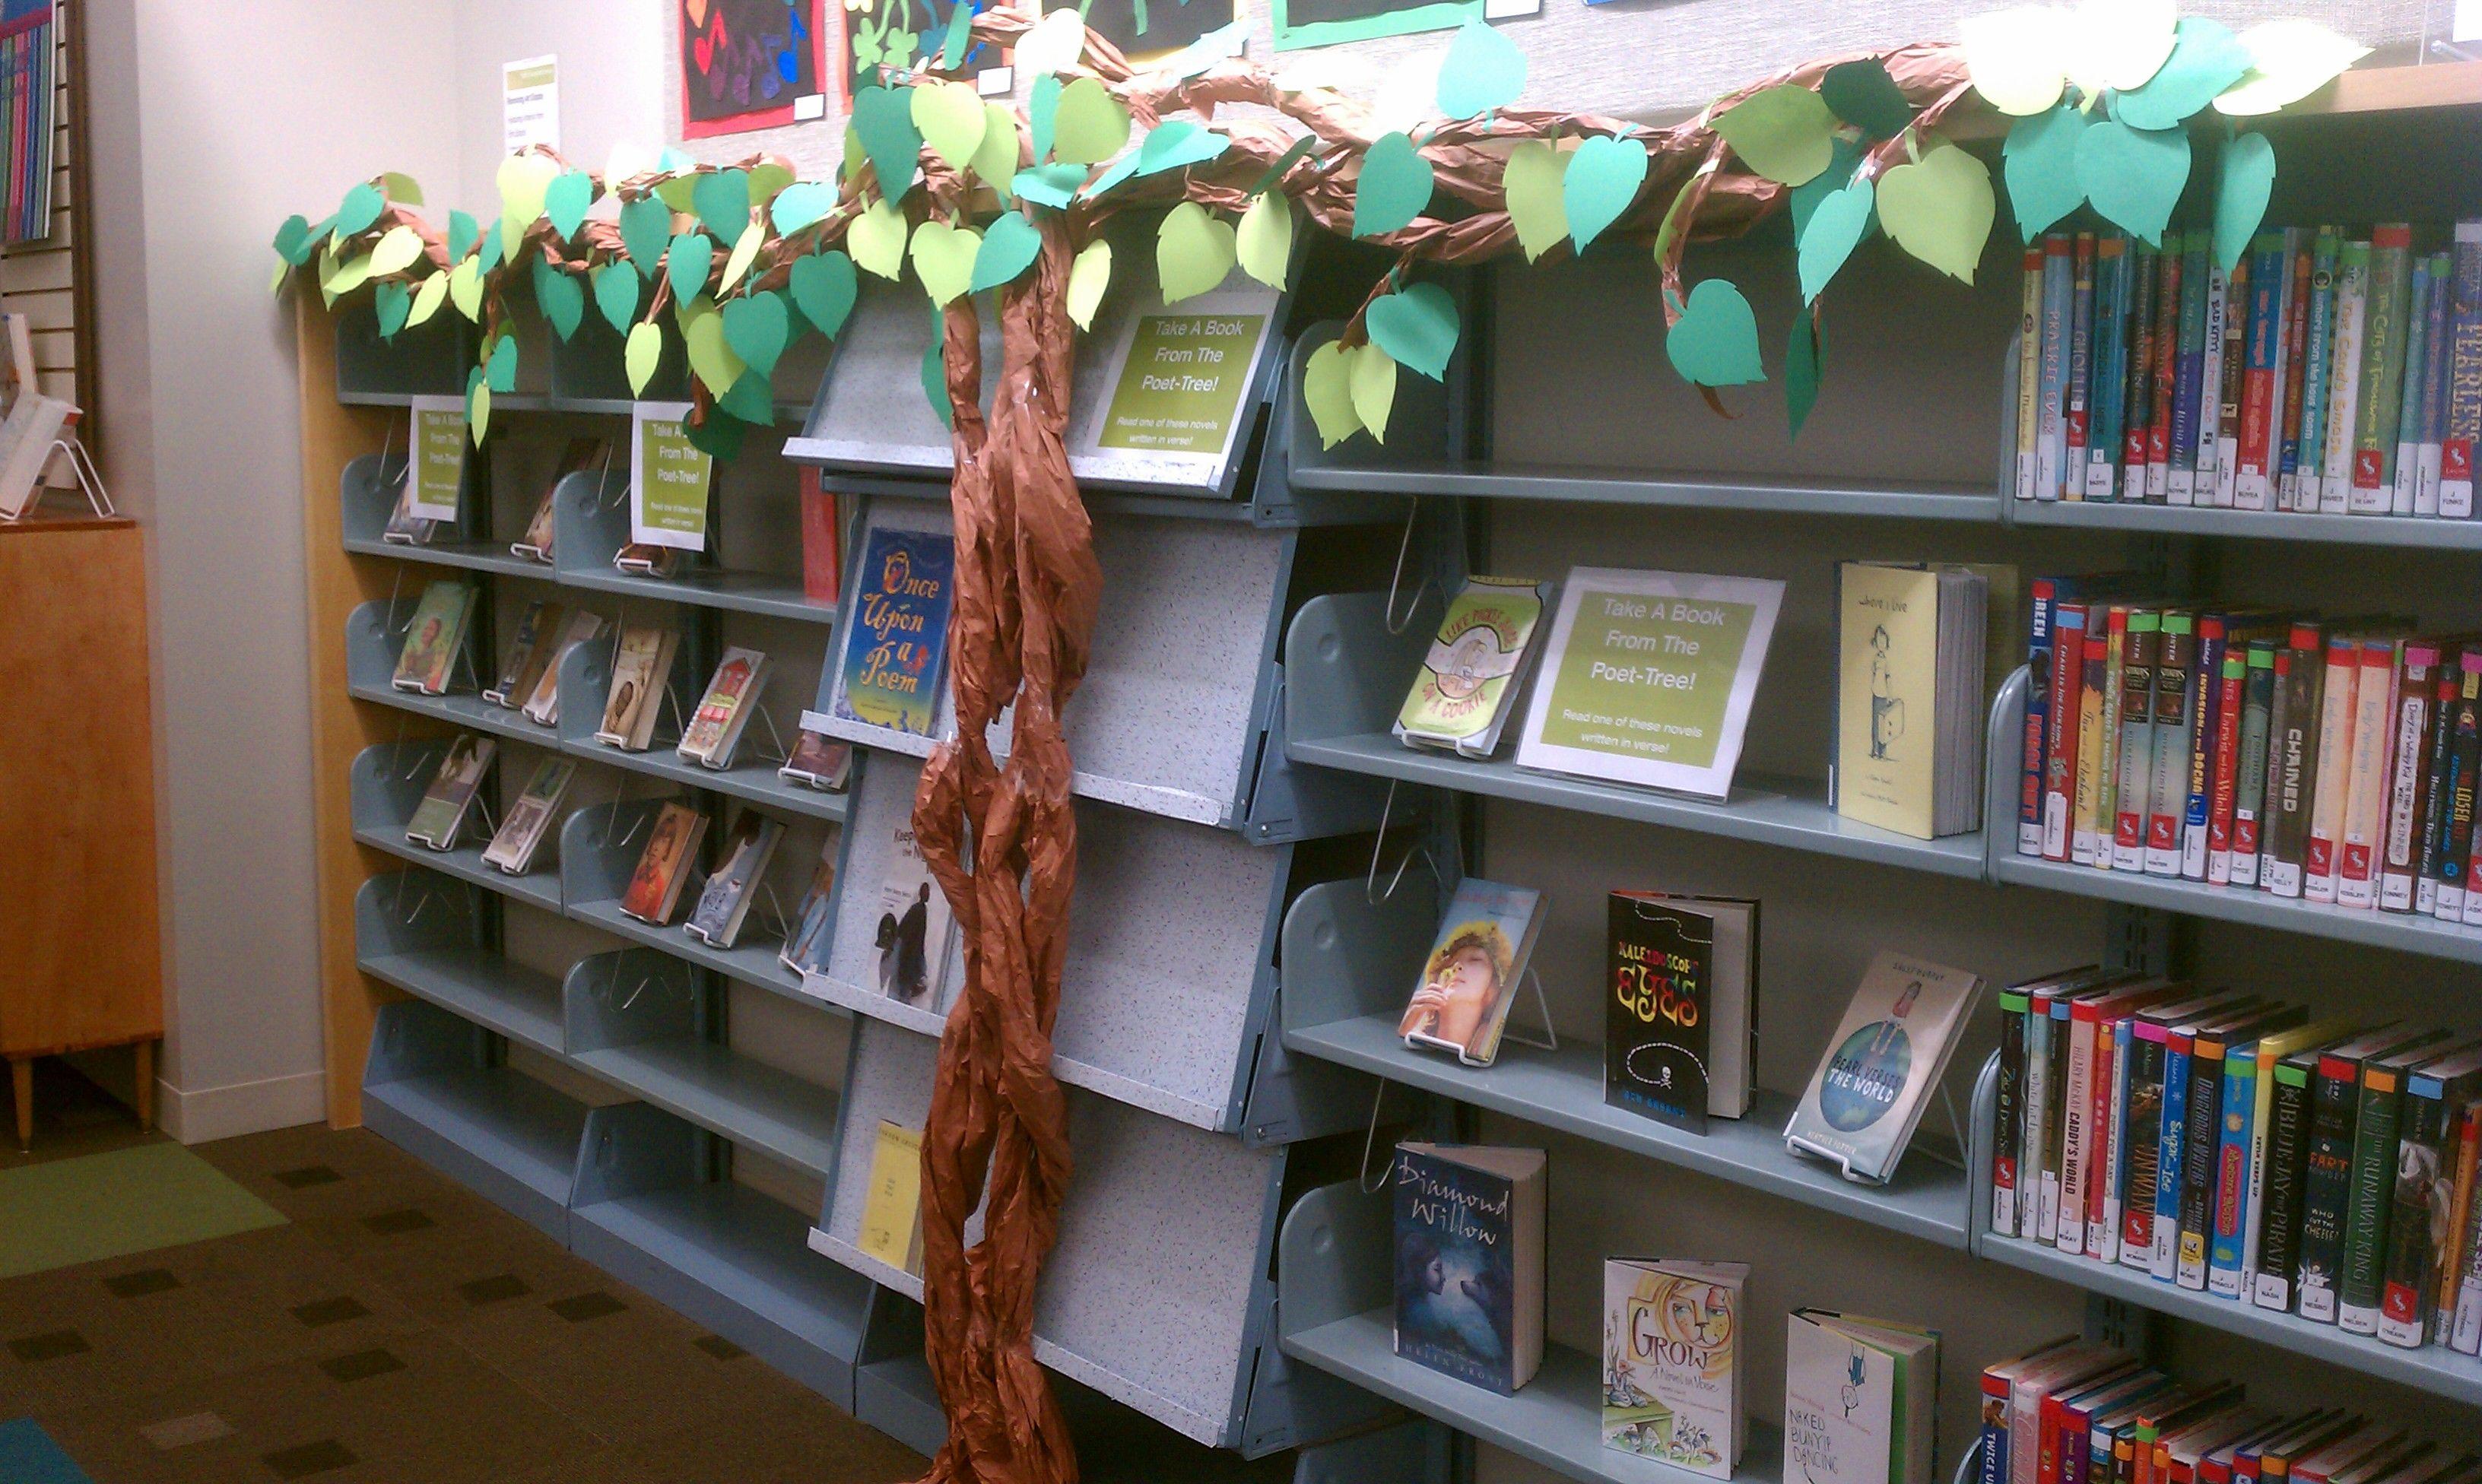 Hinsdale Public Library Poet Tree Display